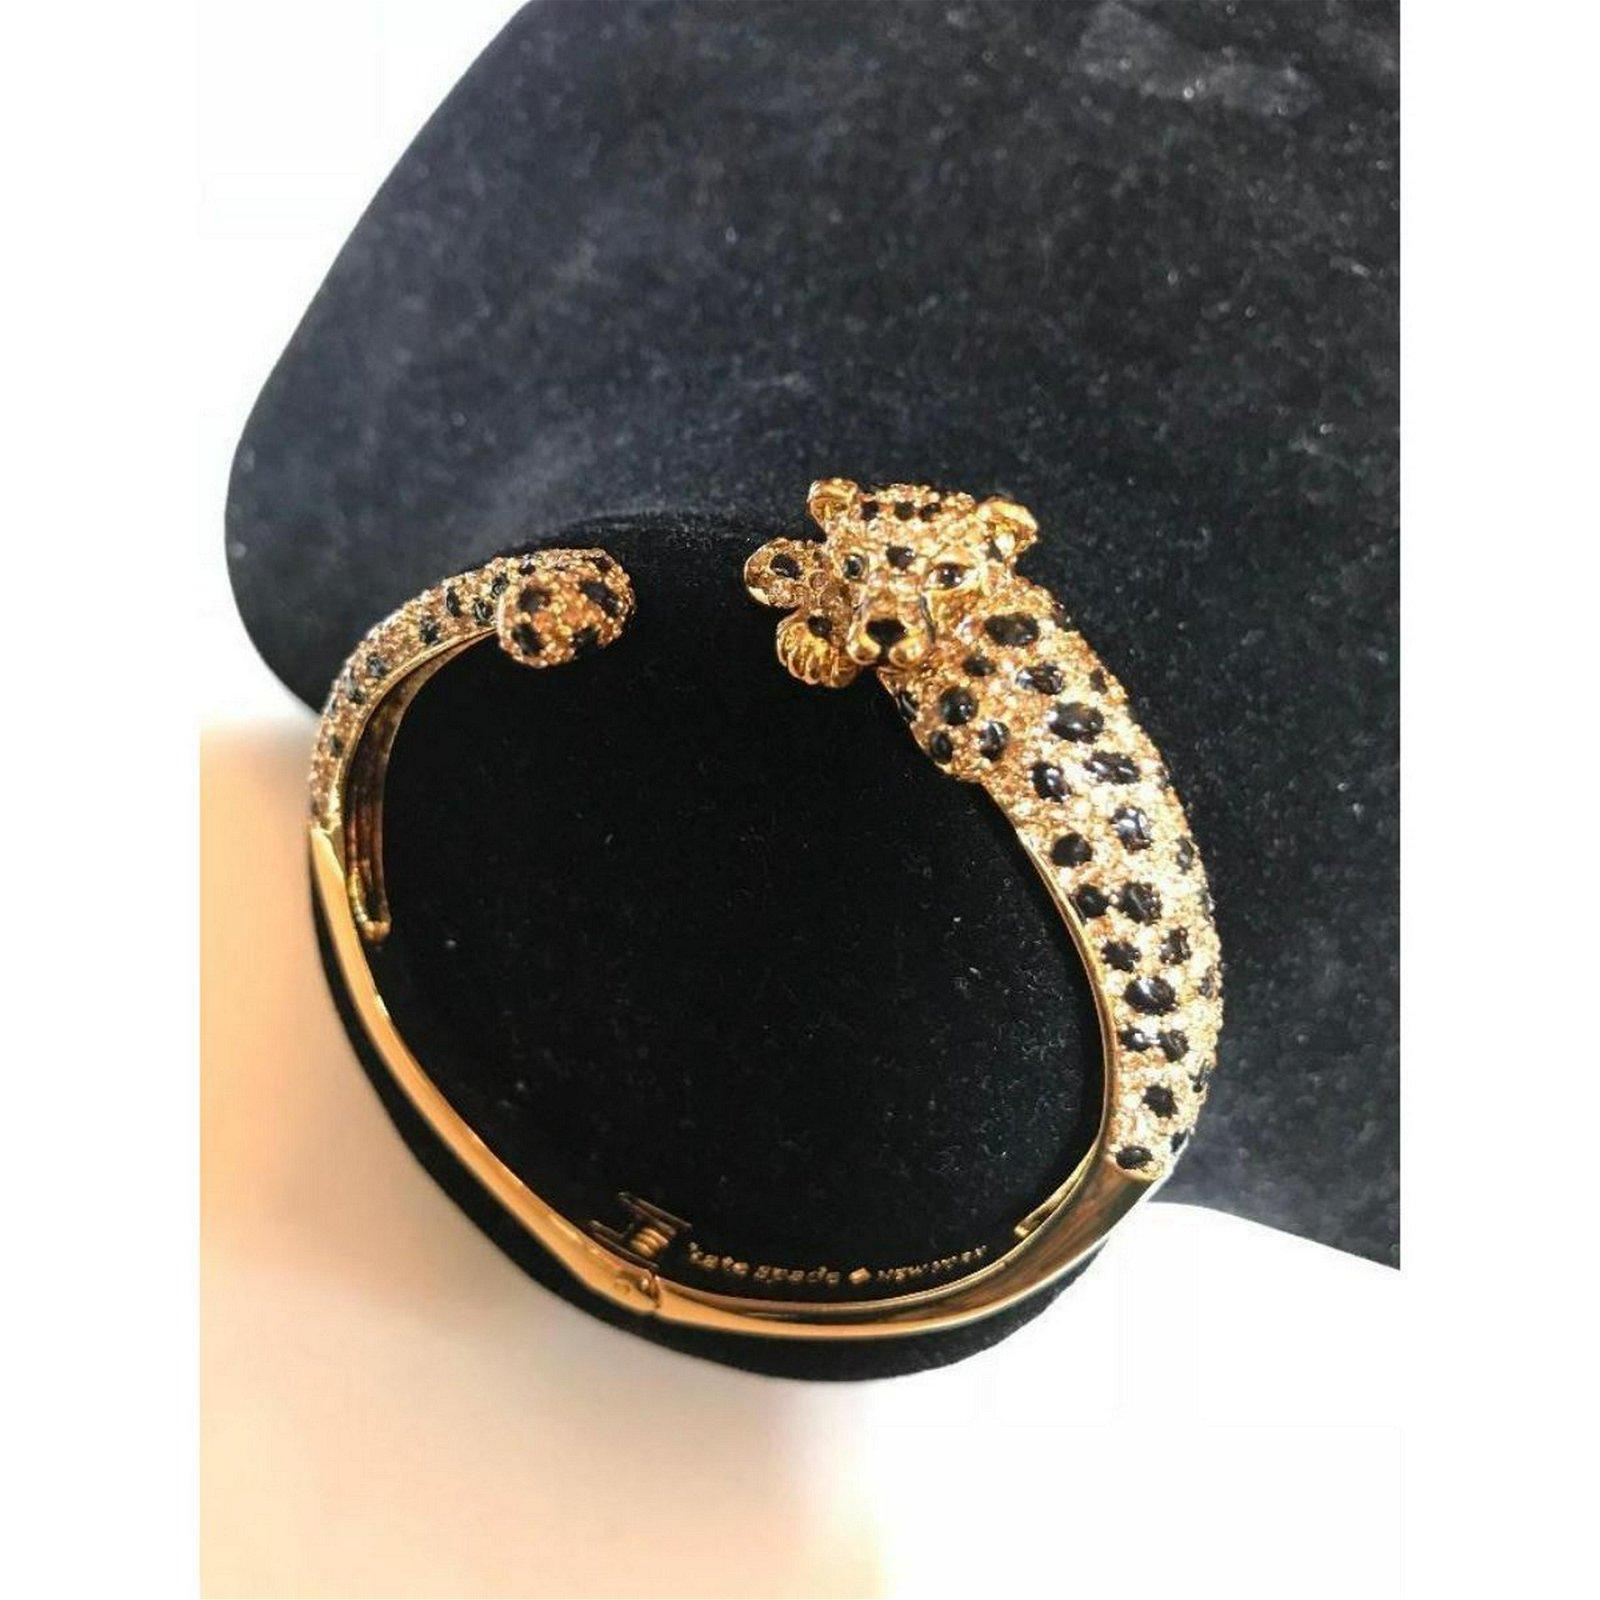 Designer Kate Spade Enamel Gold Plate Little Cheetah